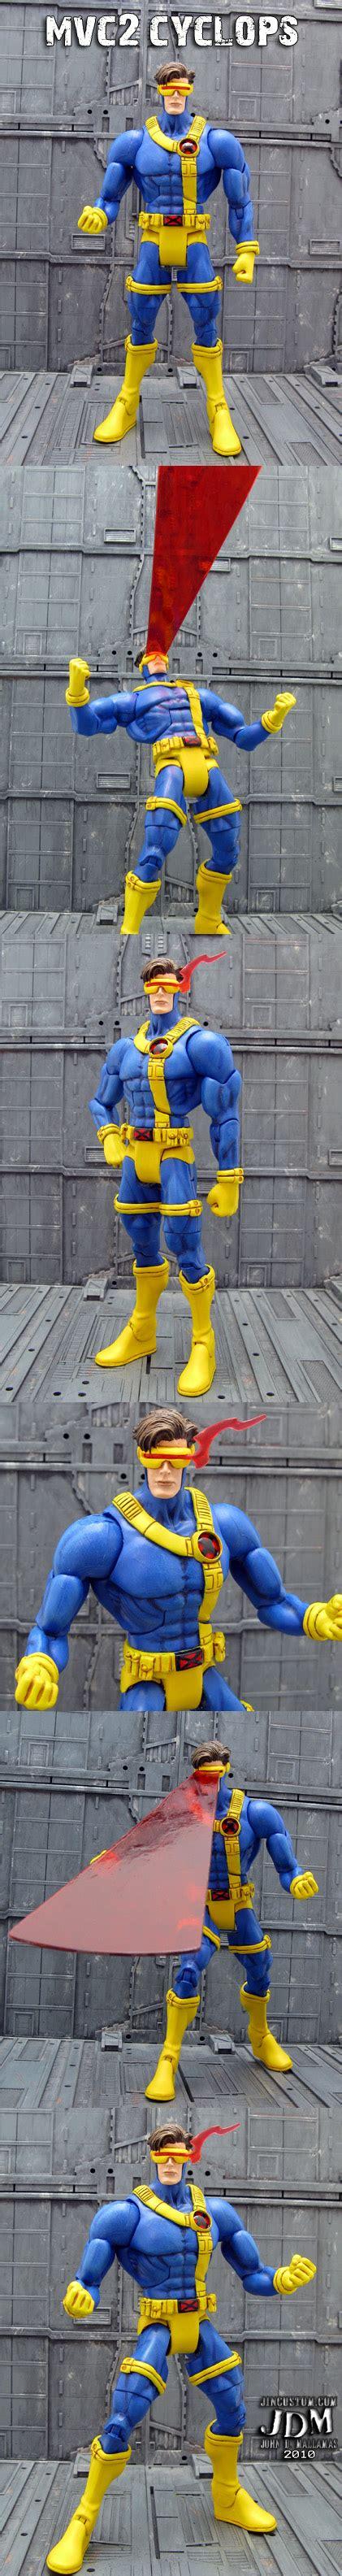 Costum Cyclops 2 custom cyclops with optic blasts mvc2